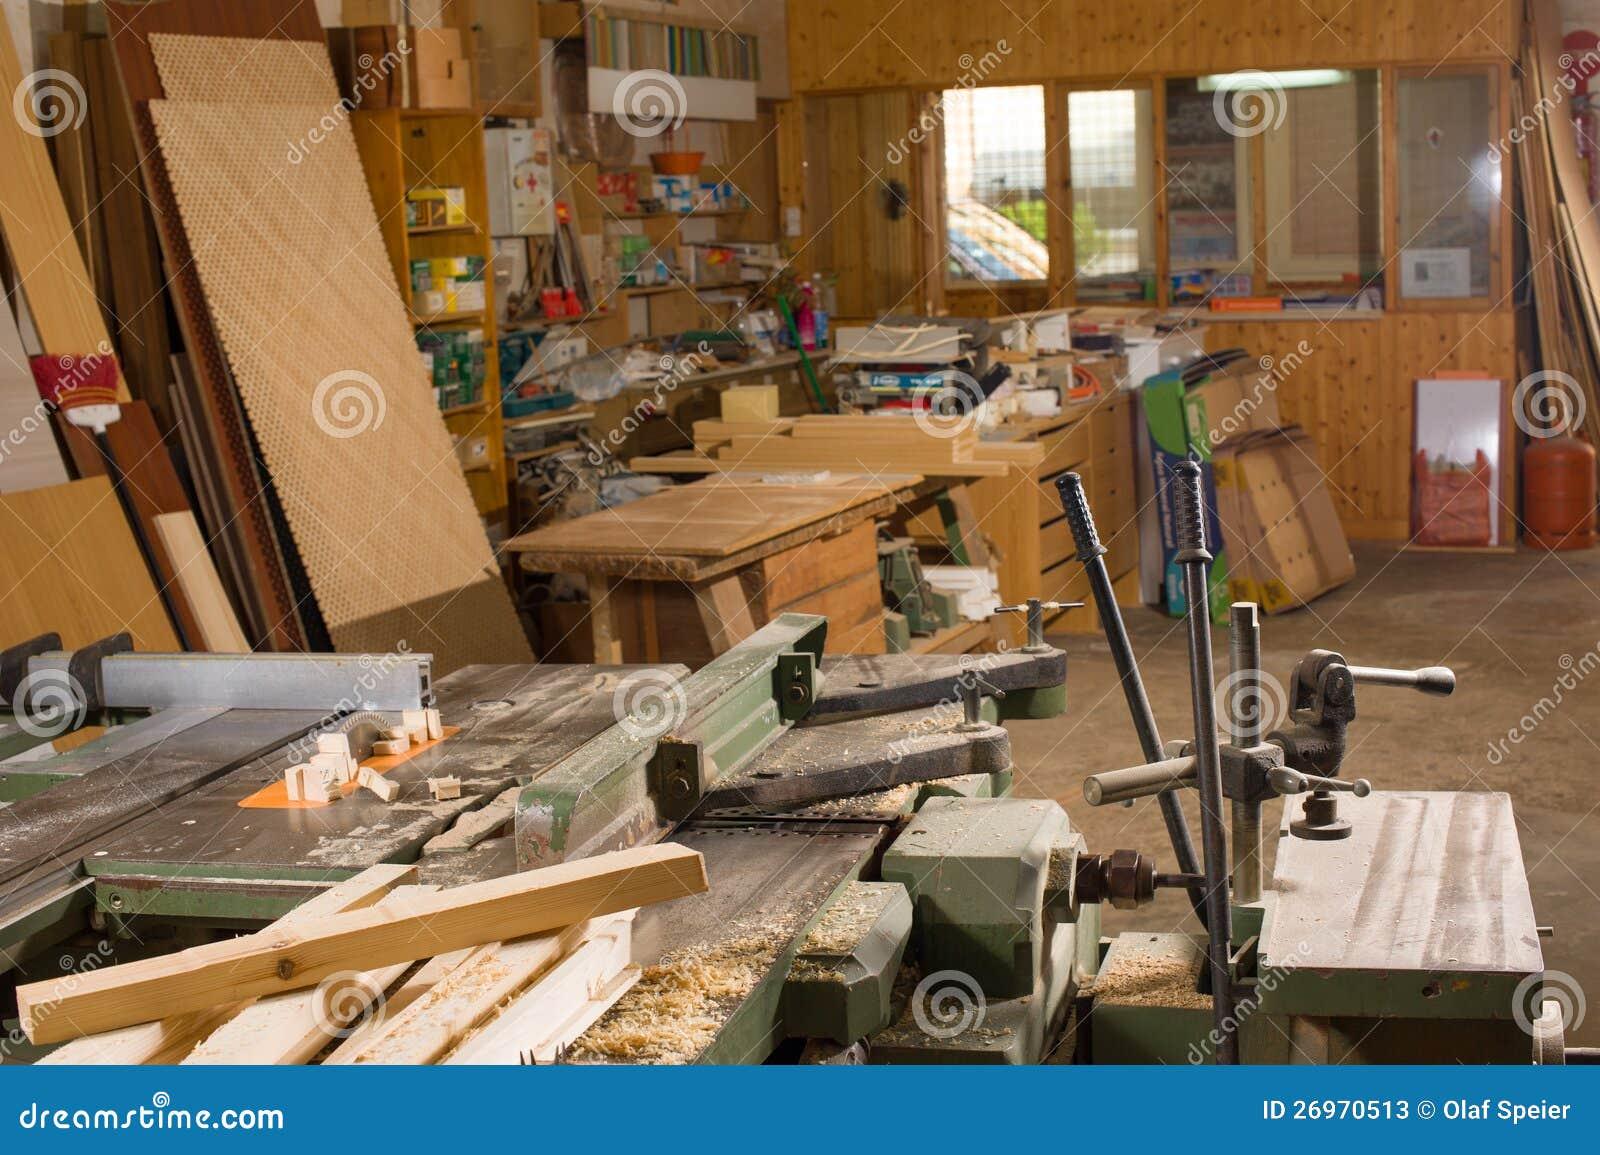 Carpenter Workshop Stock Photos - Image: 26970513